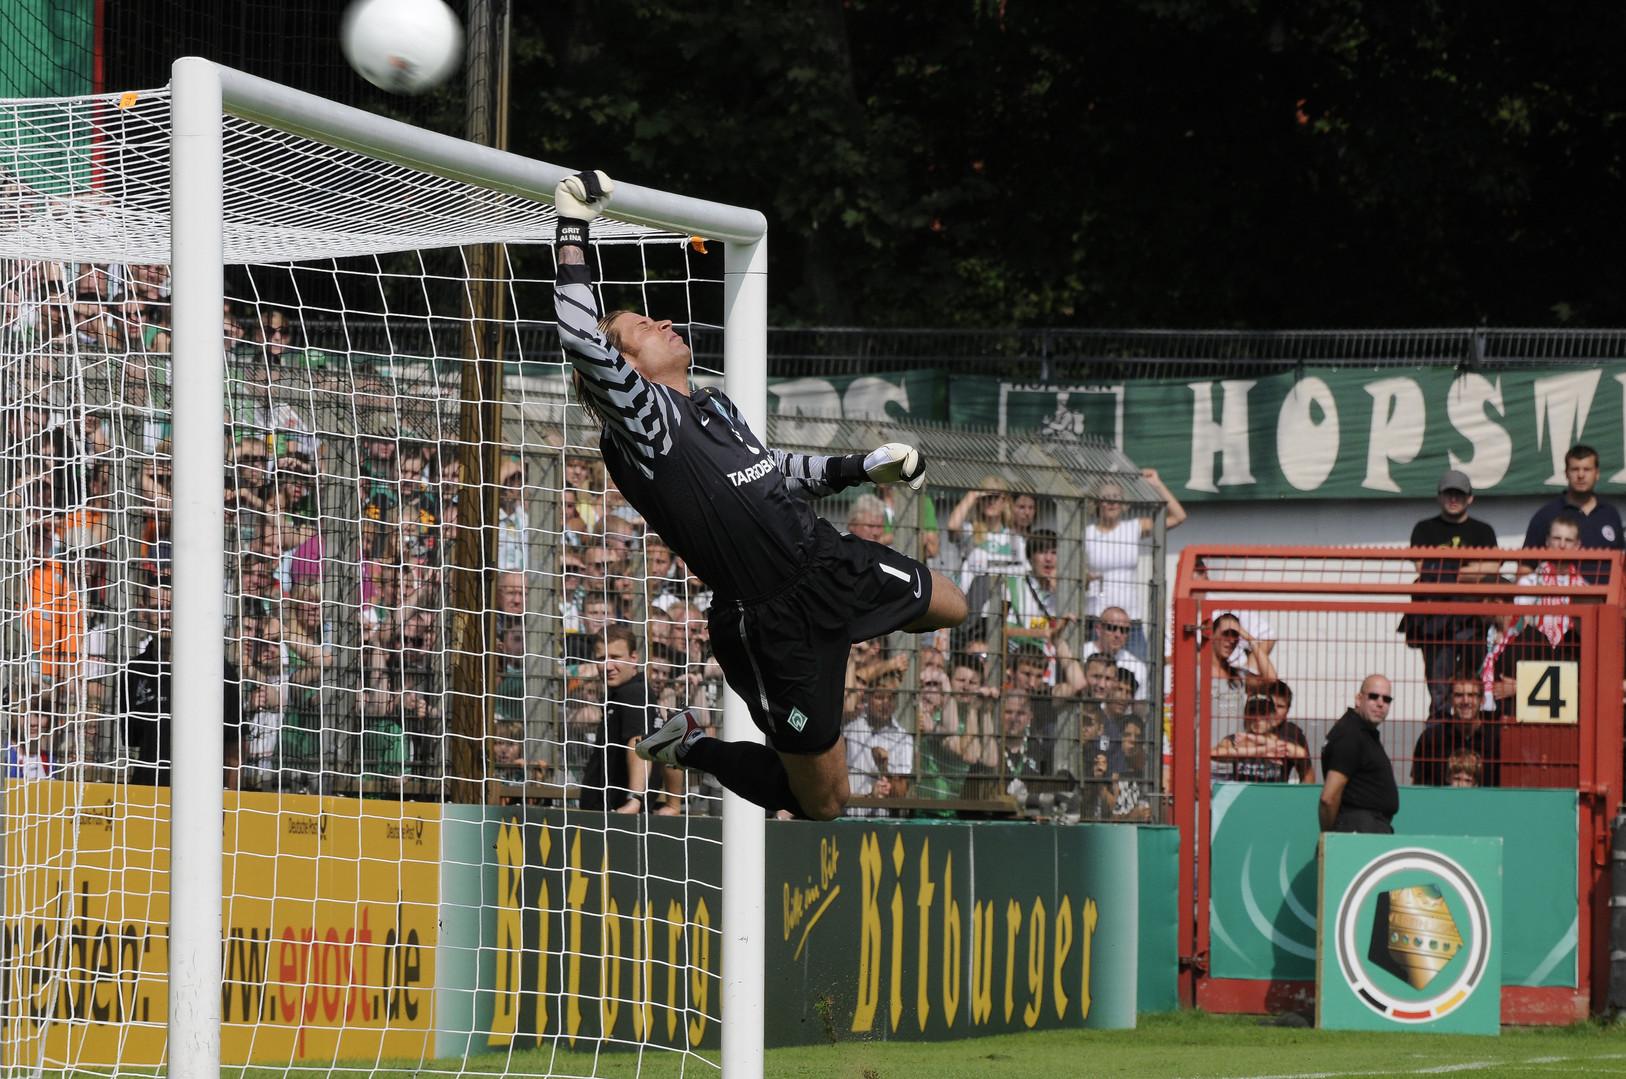 FUSSBALL DFB POKAL TIM WIESE